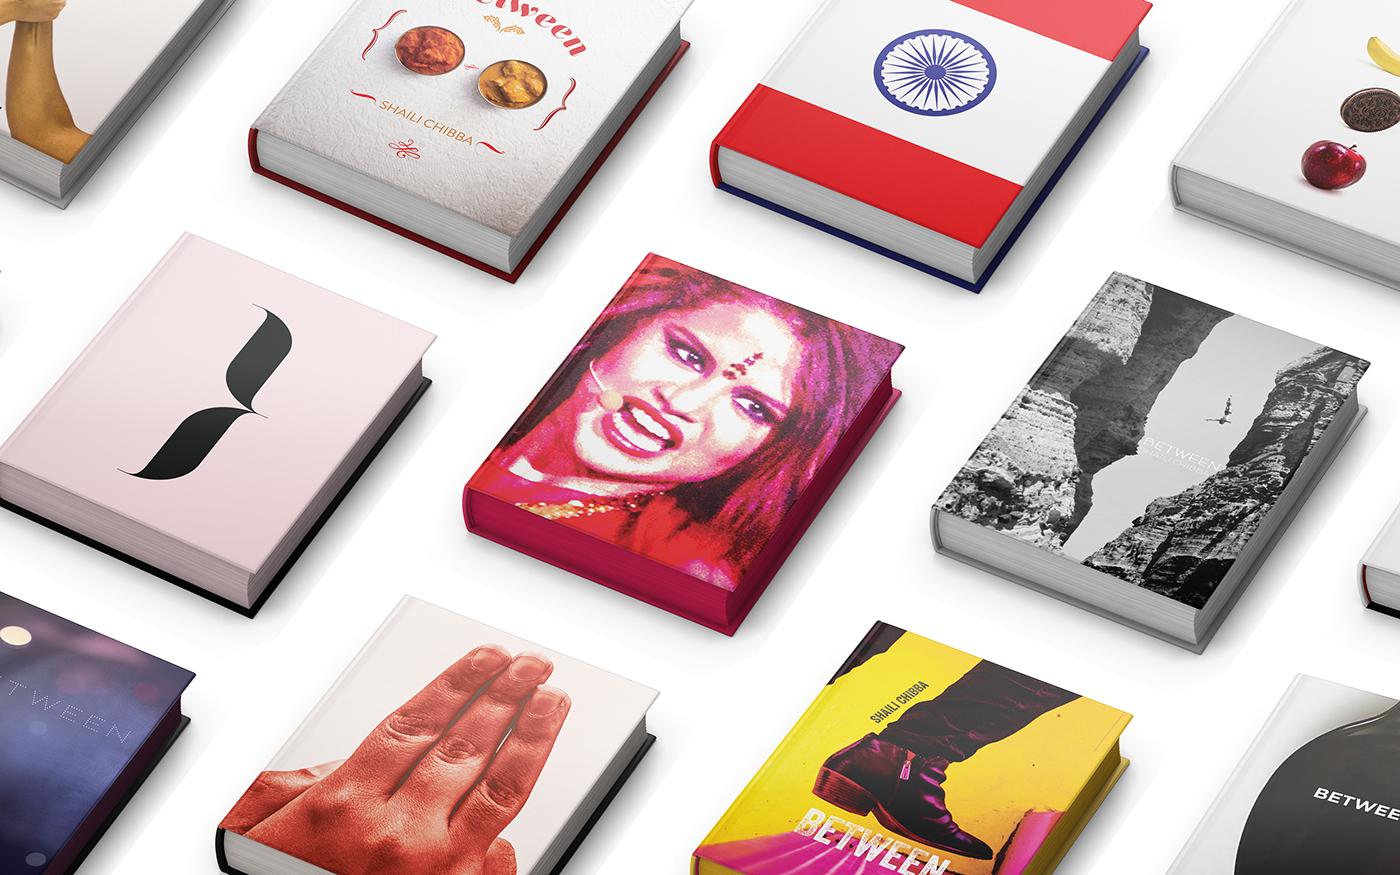 book covers between conceptual ocad university